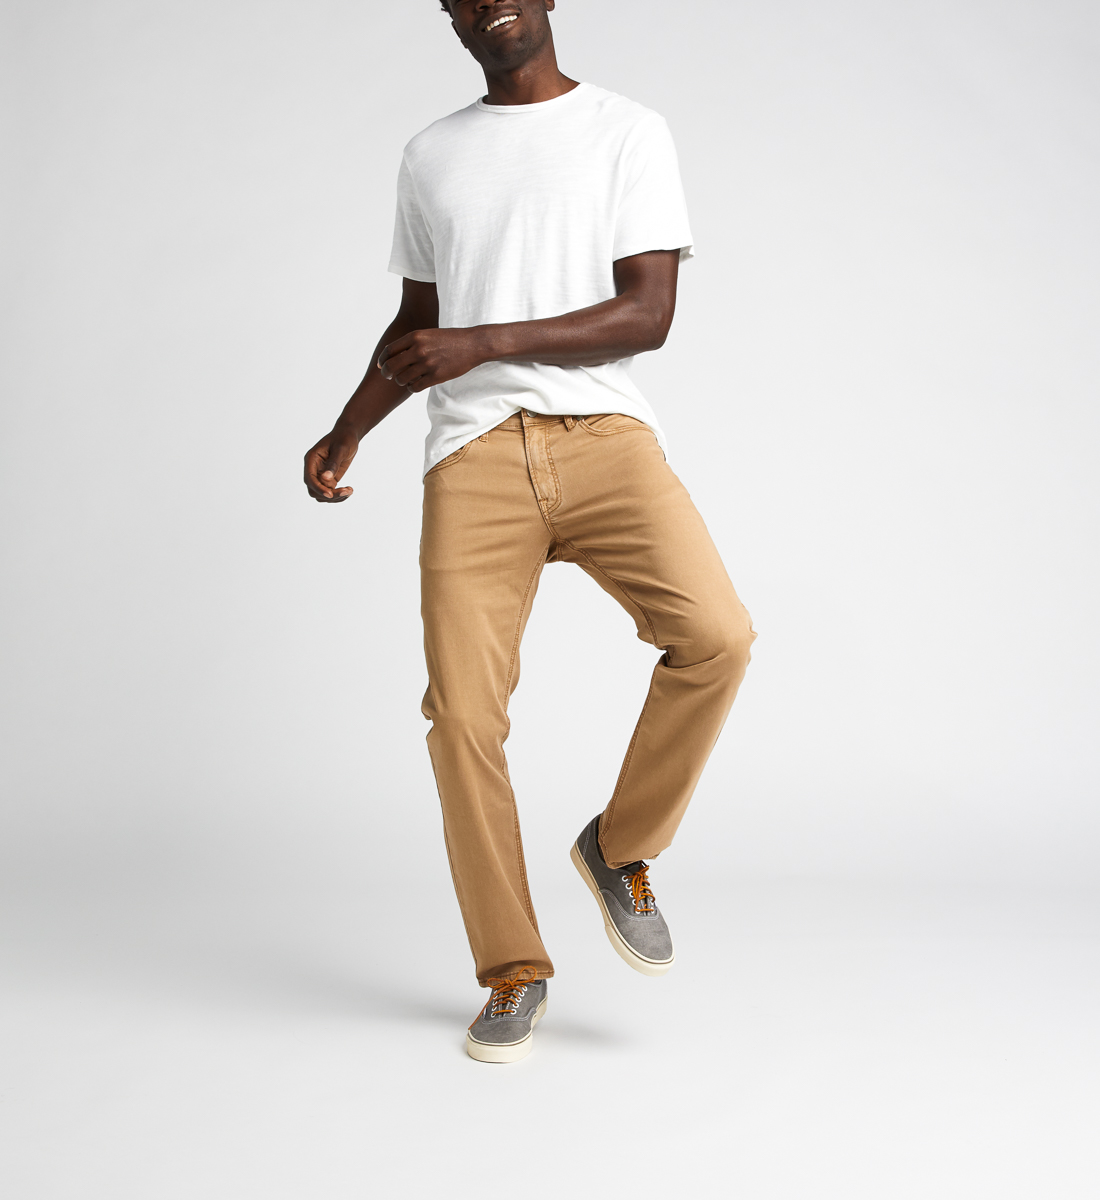 Silver Jeans Allan Classic Straight